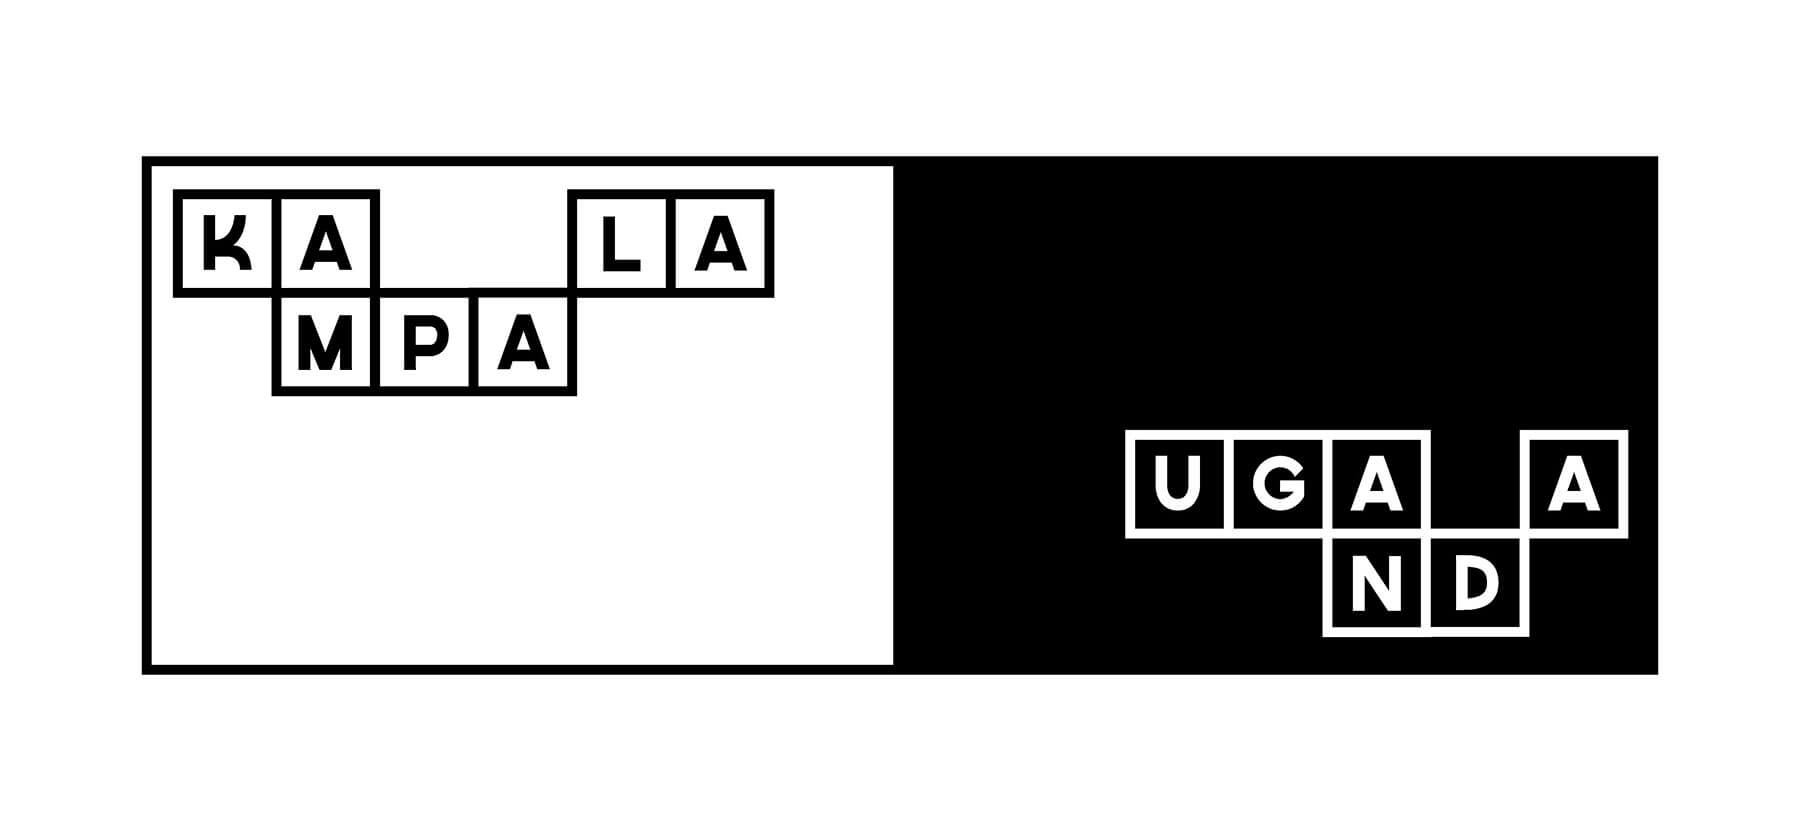 riette-error-dentsu-aegis-network-office-signage-branding-signs-kampala-uganda-08